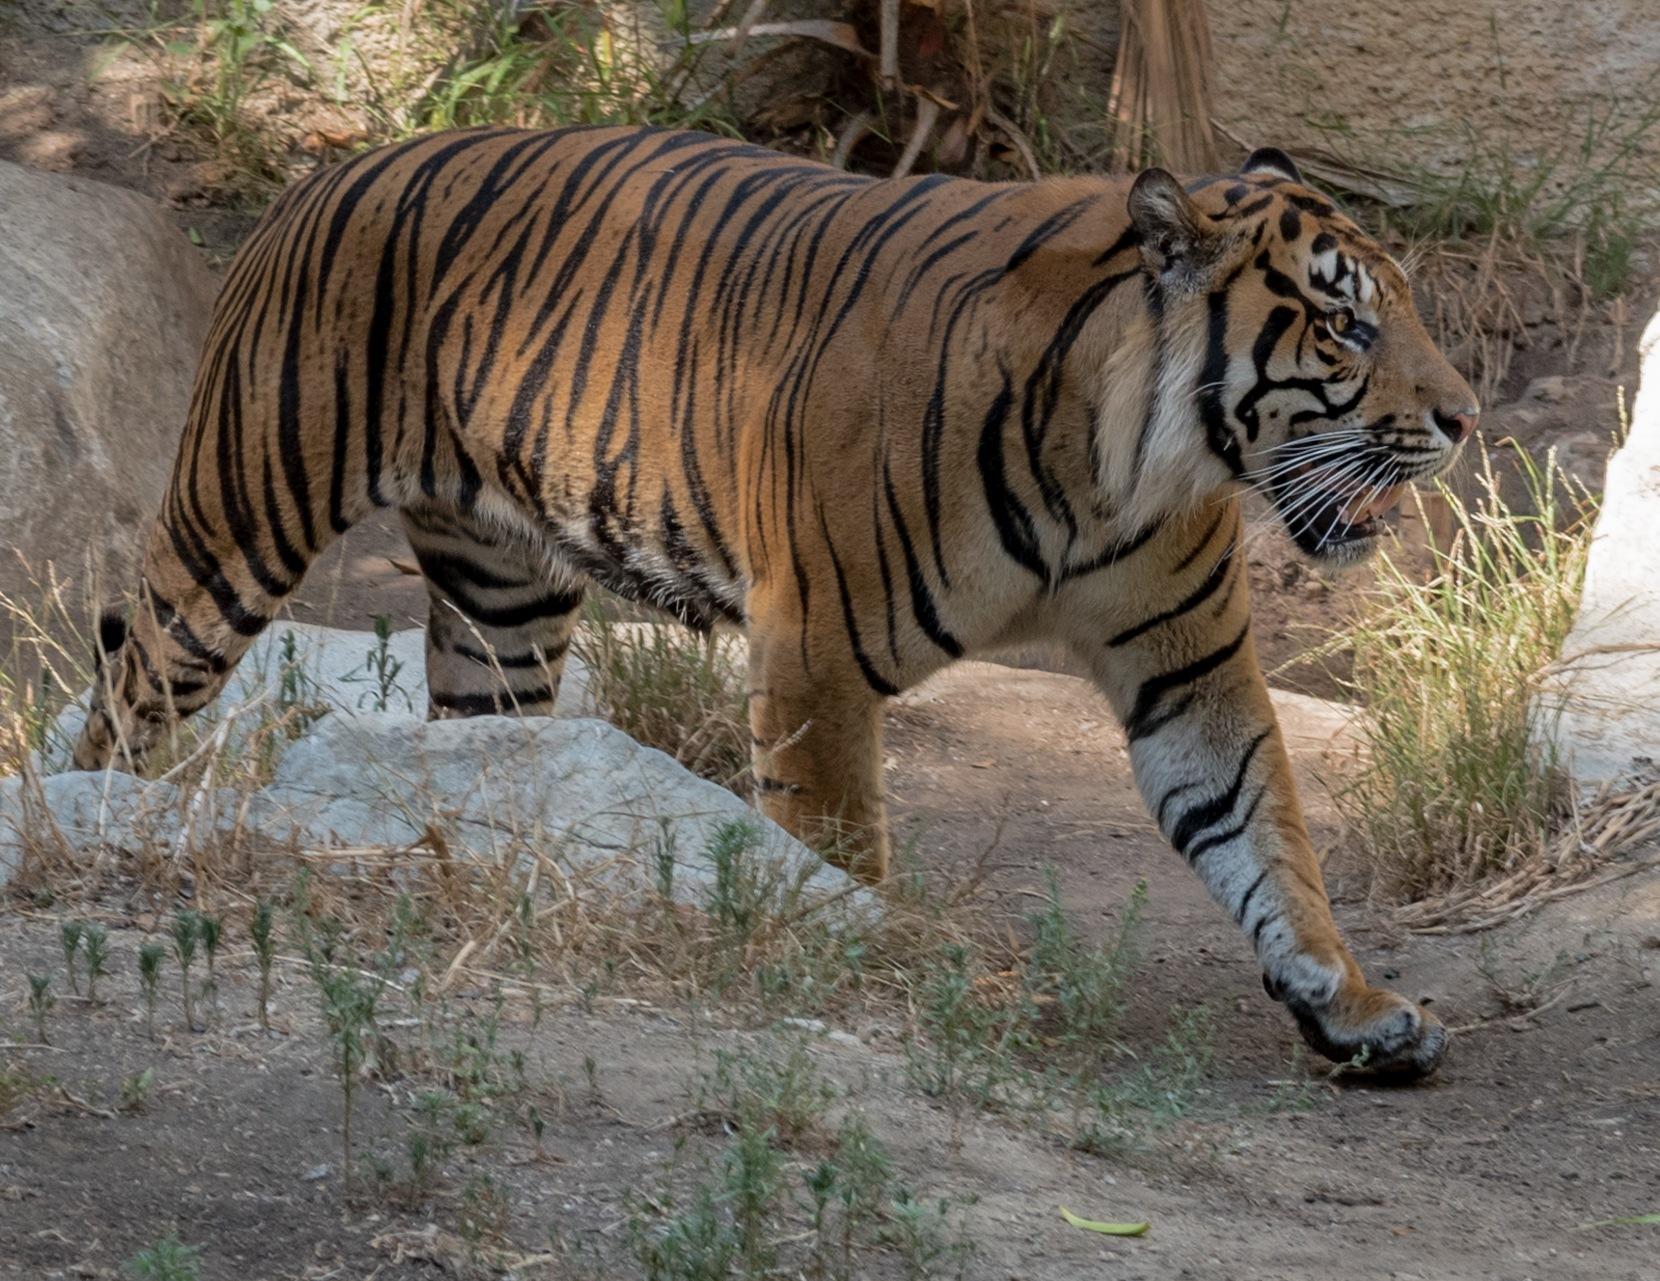 GO GET'M TIGER! by DrJohnHodgson